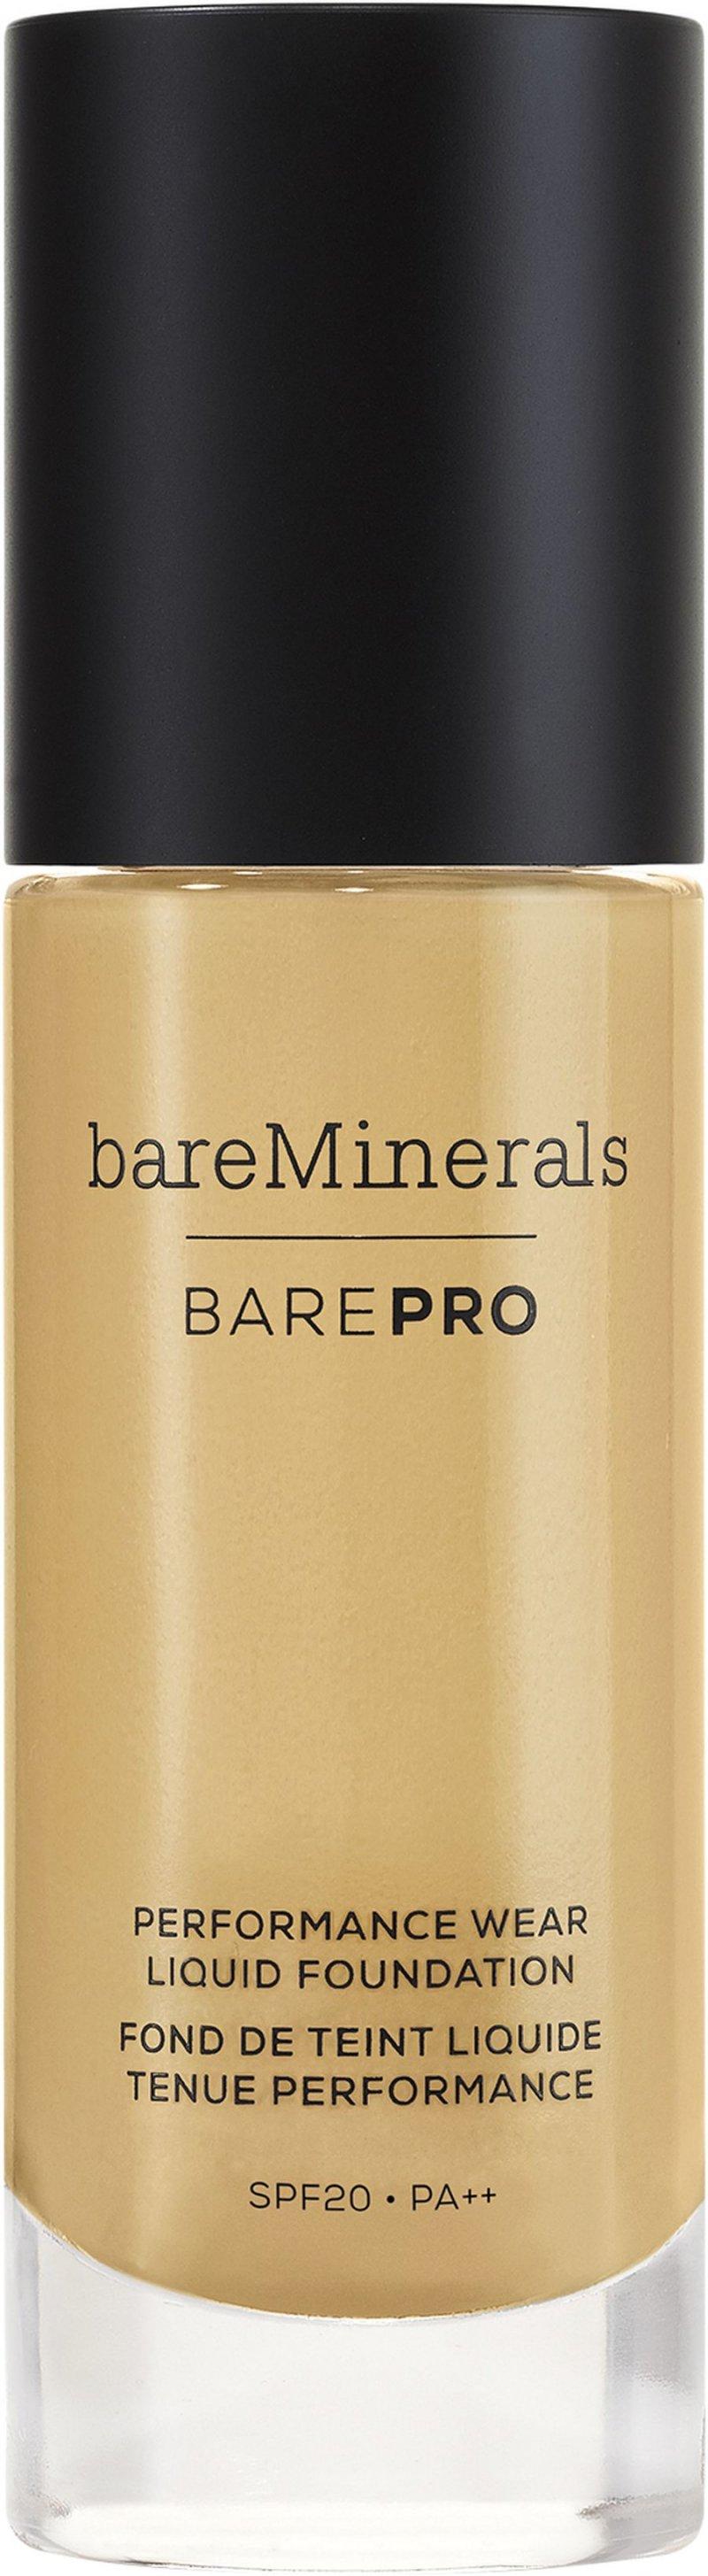 Image of   Bareminerals Foundation - Barepro Performance Wear Liquid - Camel 17